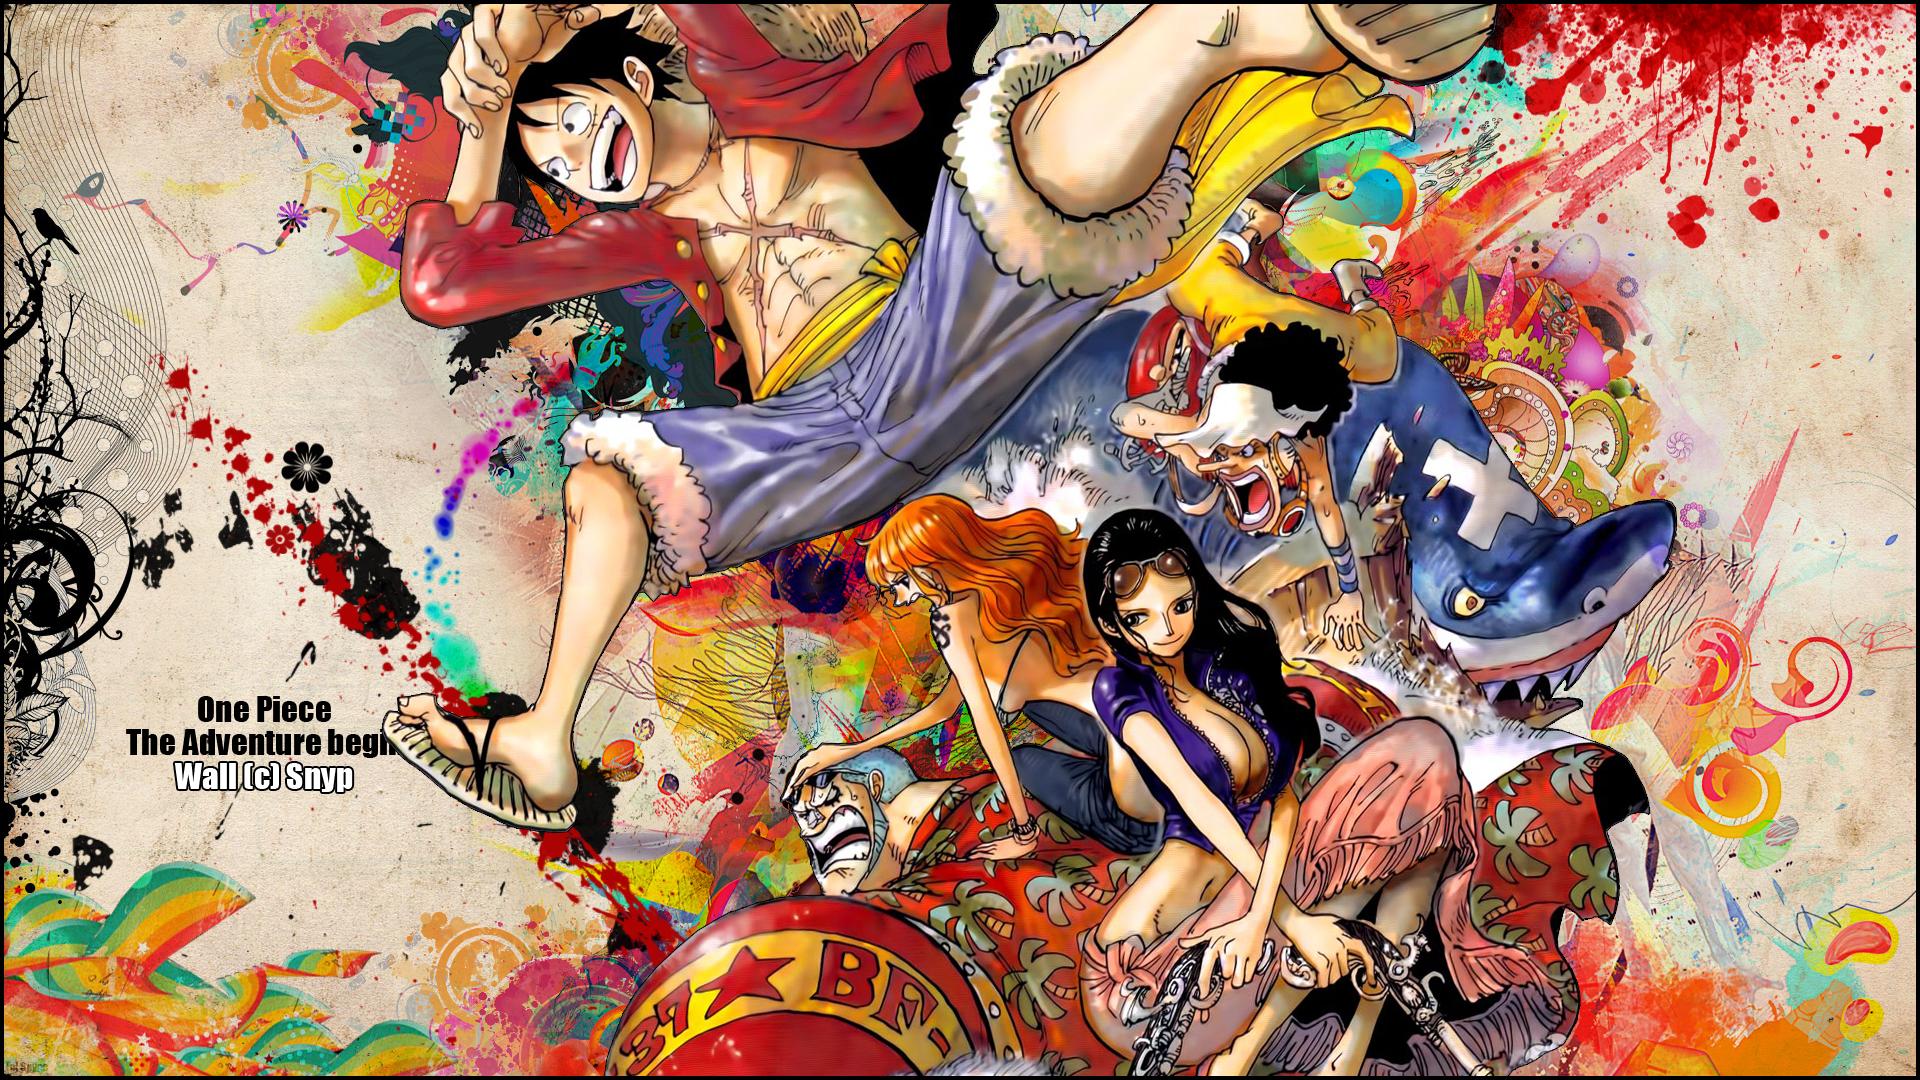 One Piece Fond d'écran HD | Arrière-Plan | 1920x1080 | ID:717356 - Wallpaper Abyss